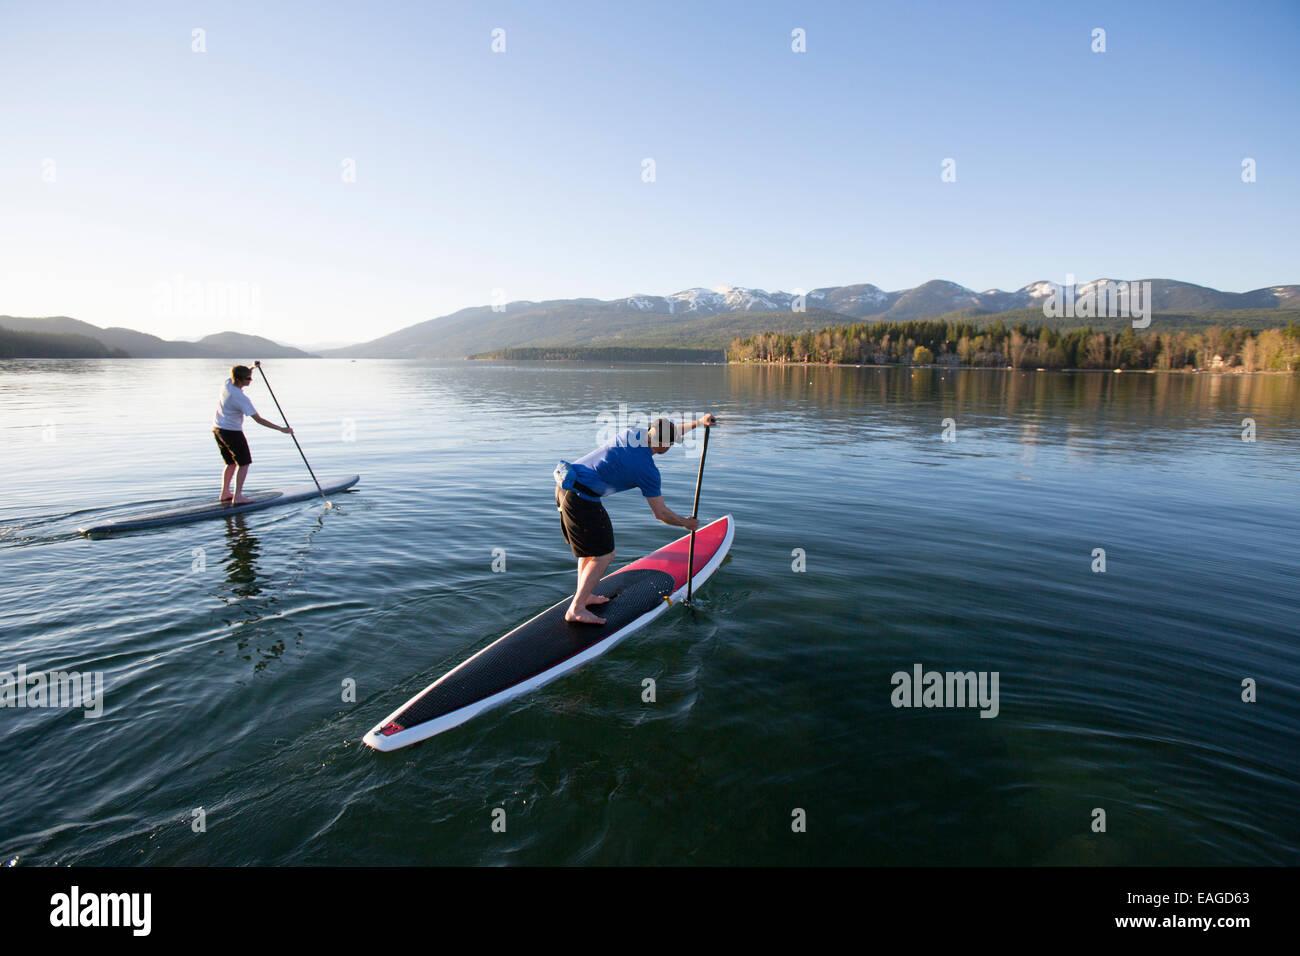 Un encaje macho y hembra el stand up paddle board (SUP) al atardecer en Whitefish Lake en Whitefish, Montana. Imagen De Stock